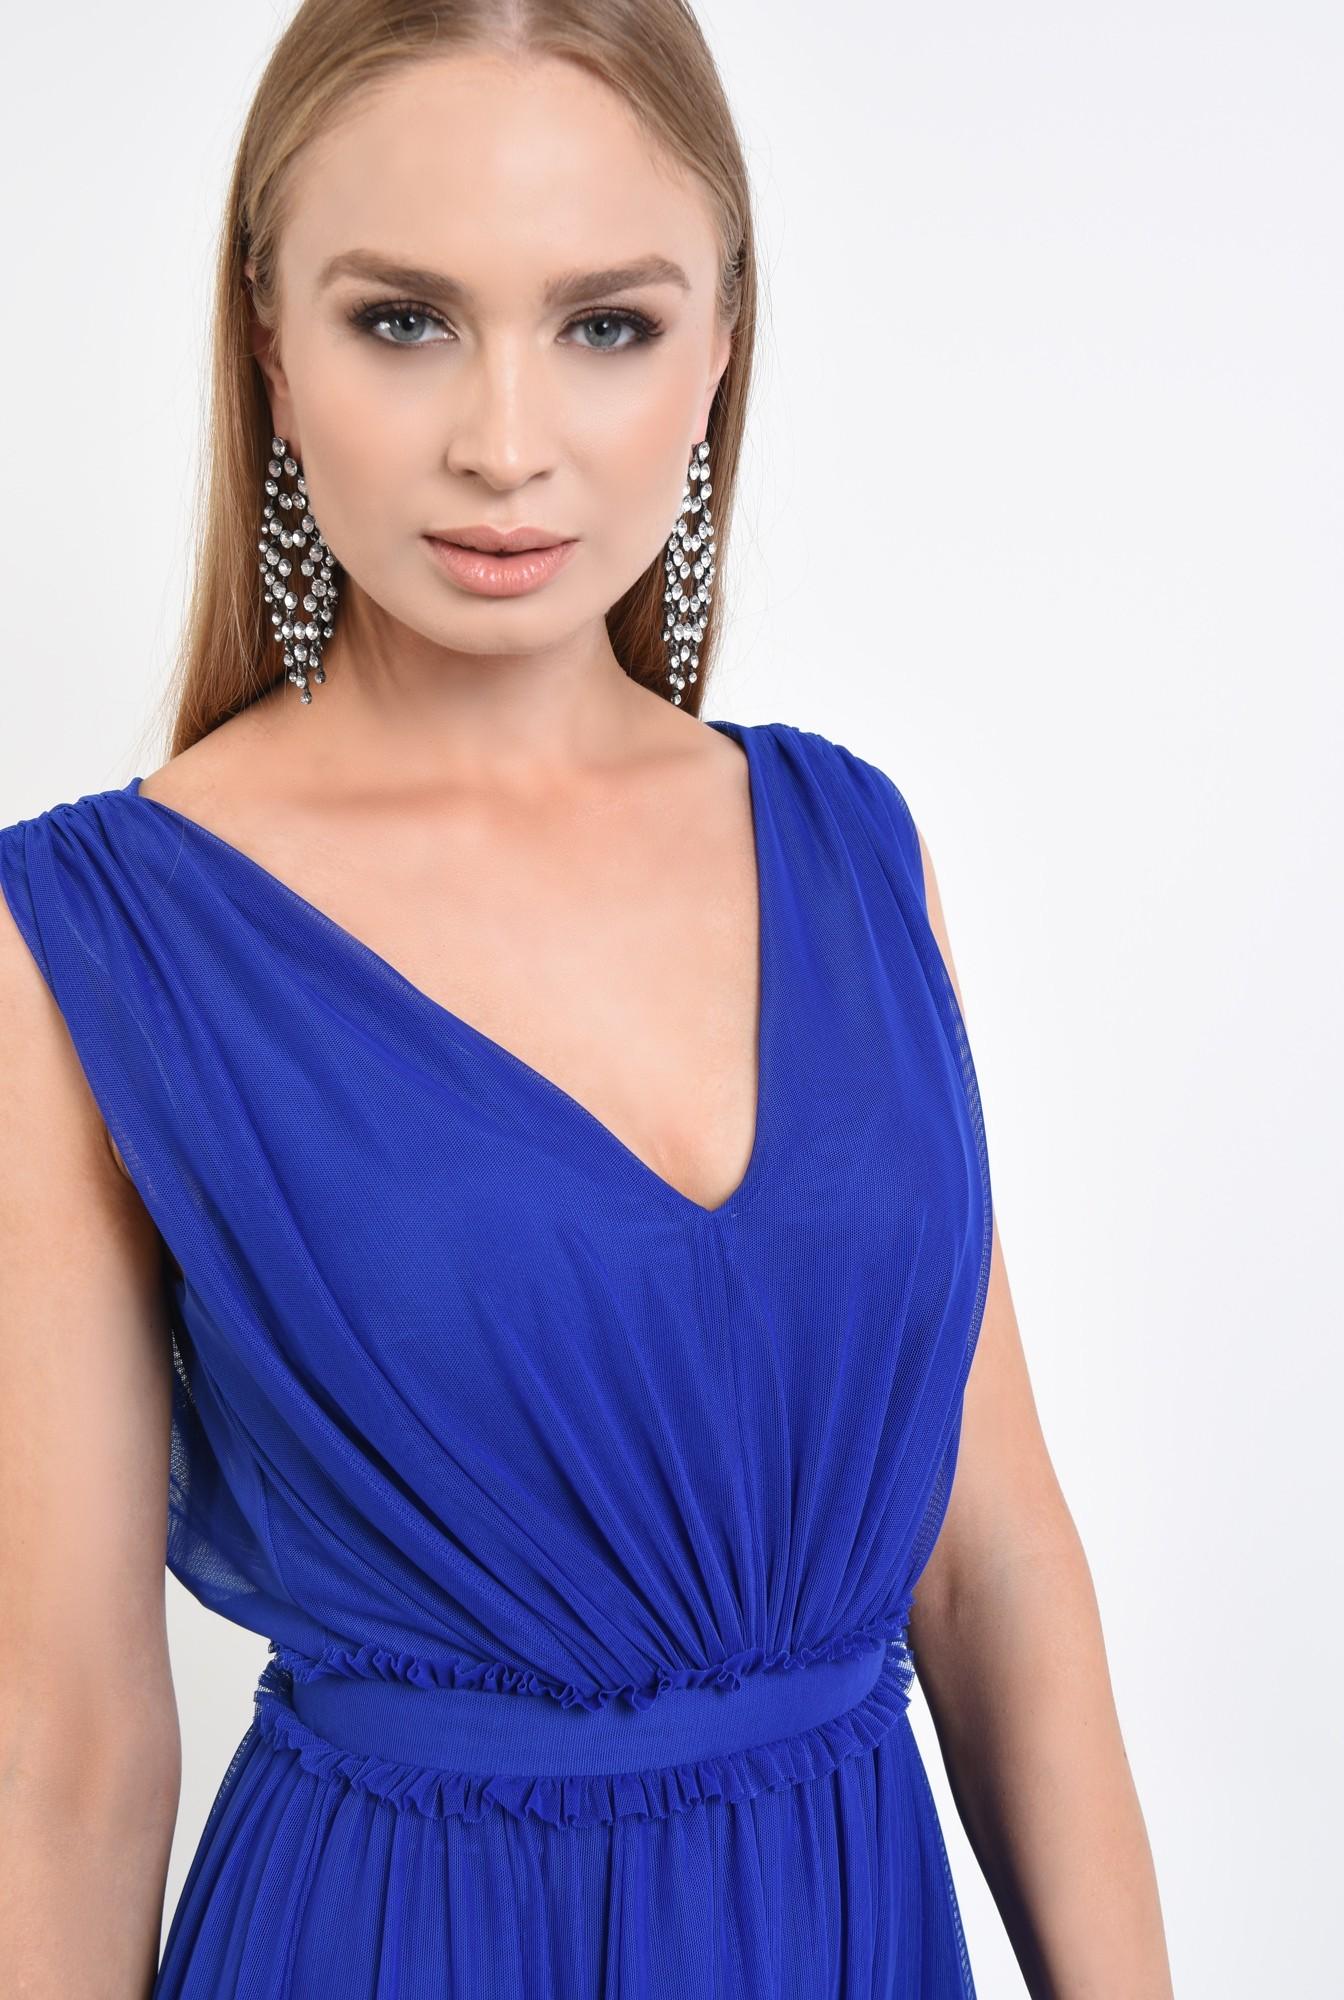 2 - 360 - rochie de seara, tul, albastru, clos, midi, rochii online